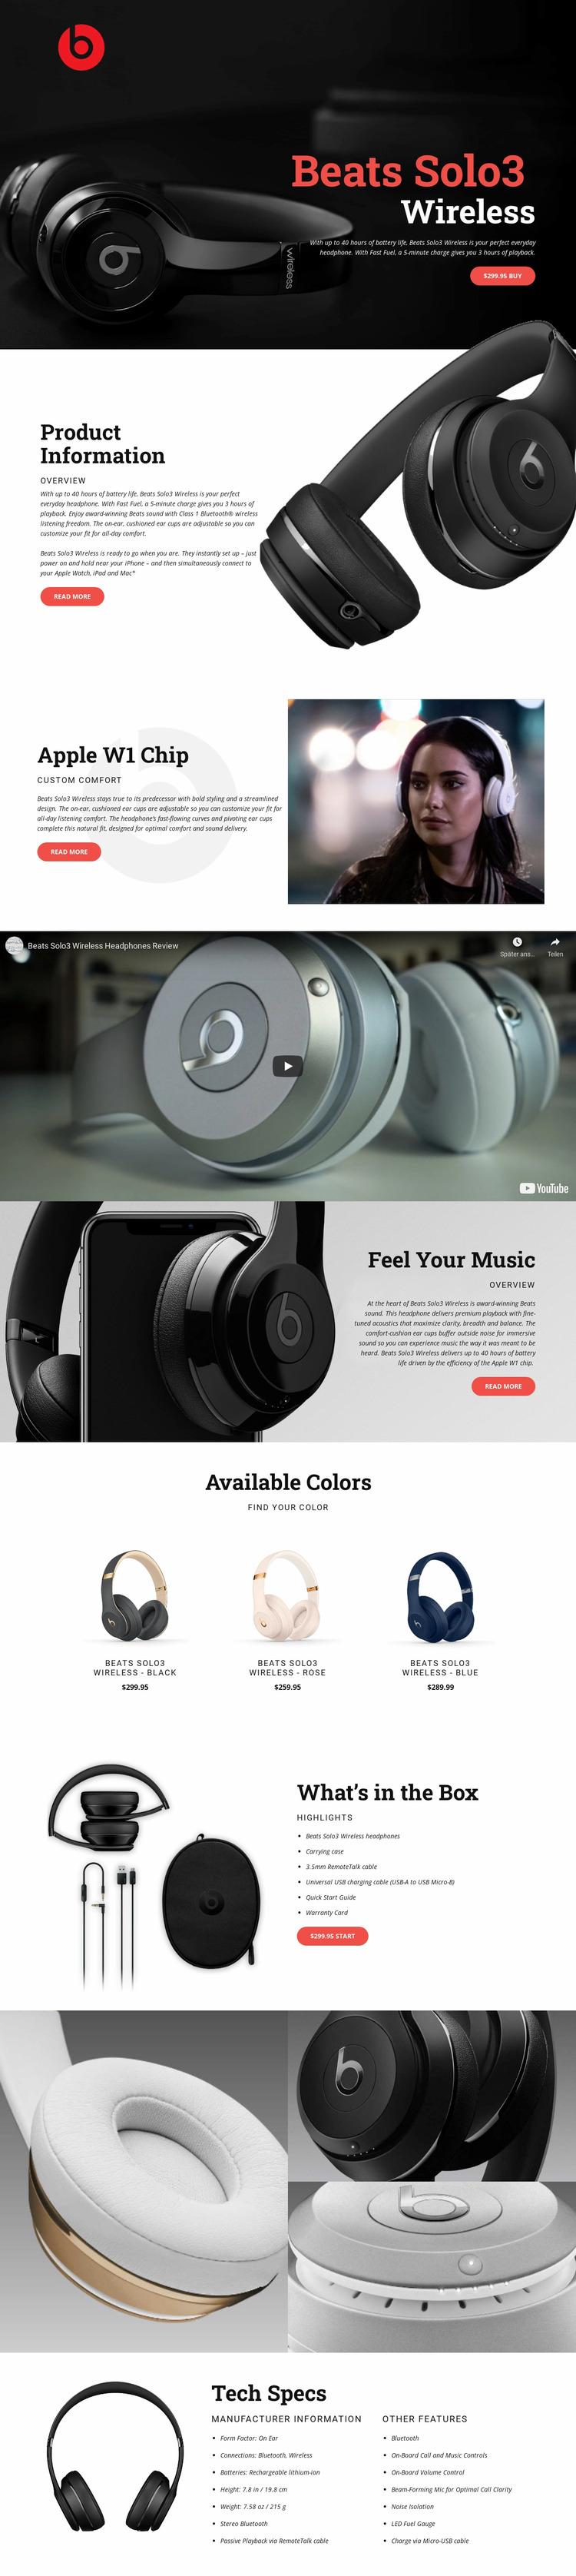 Outstanding quality of music WordPress Website Builder